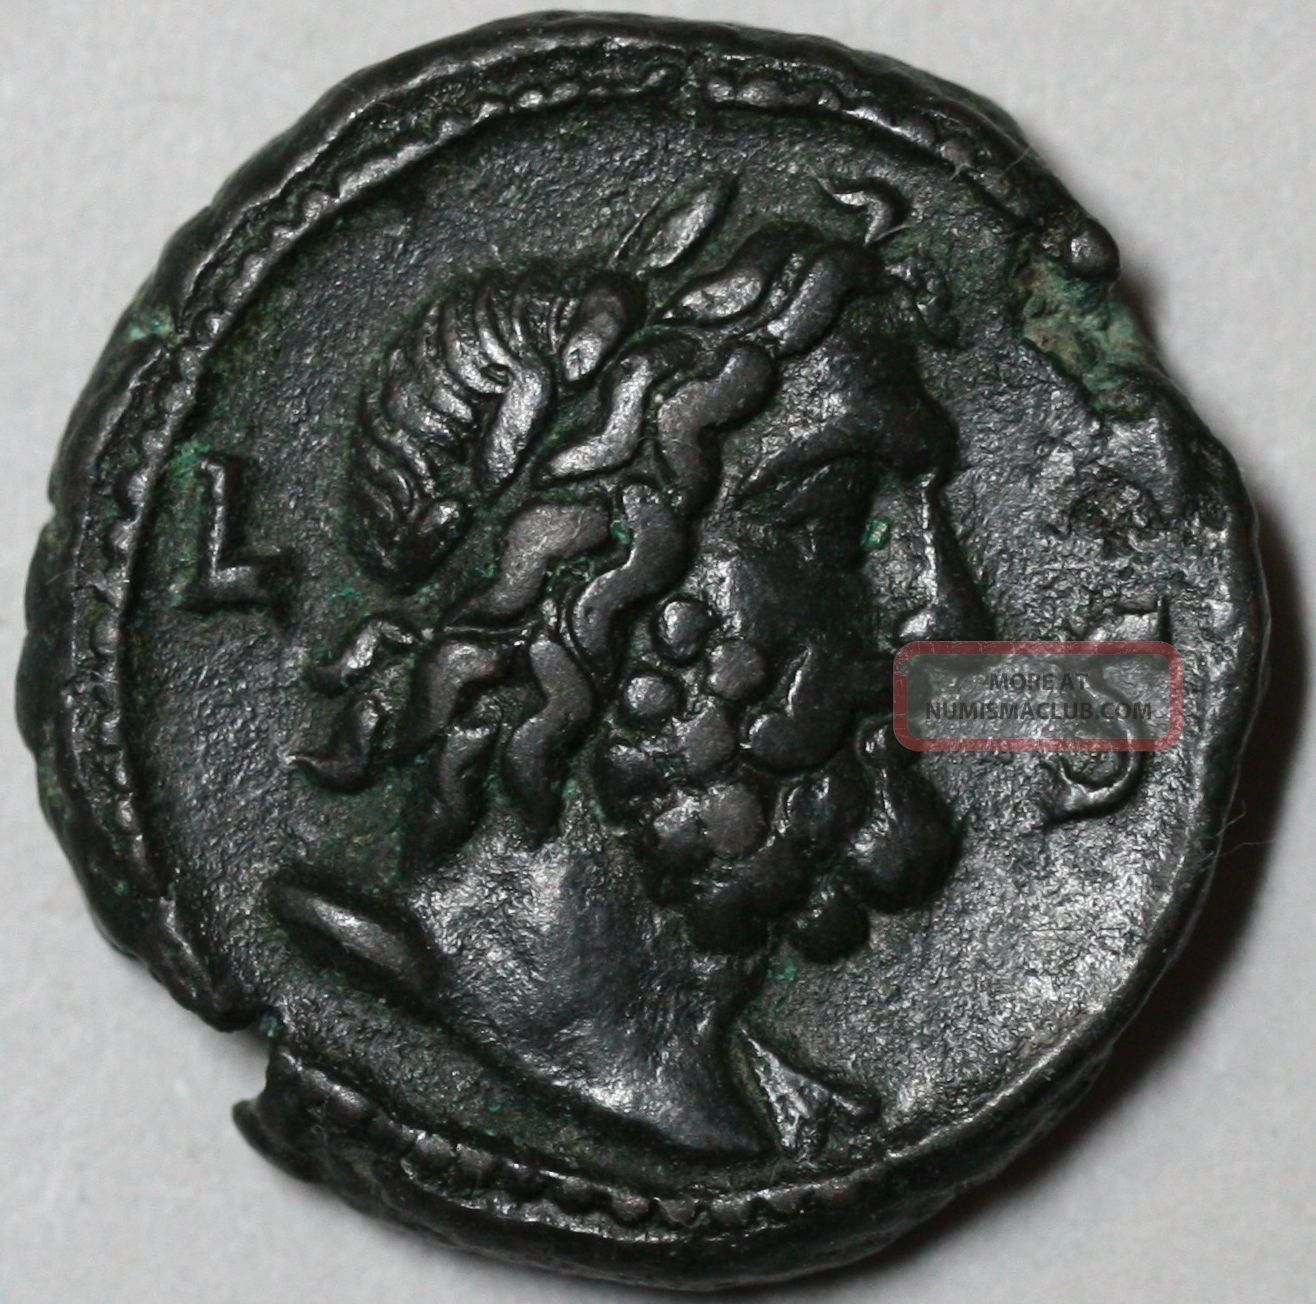 258 Valerian I Roman Egypt Zeus Bust Tetradrachm Year 6 (ex Cng) Ancient Coin Coins: Ancient photo